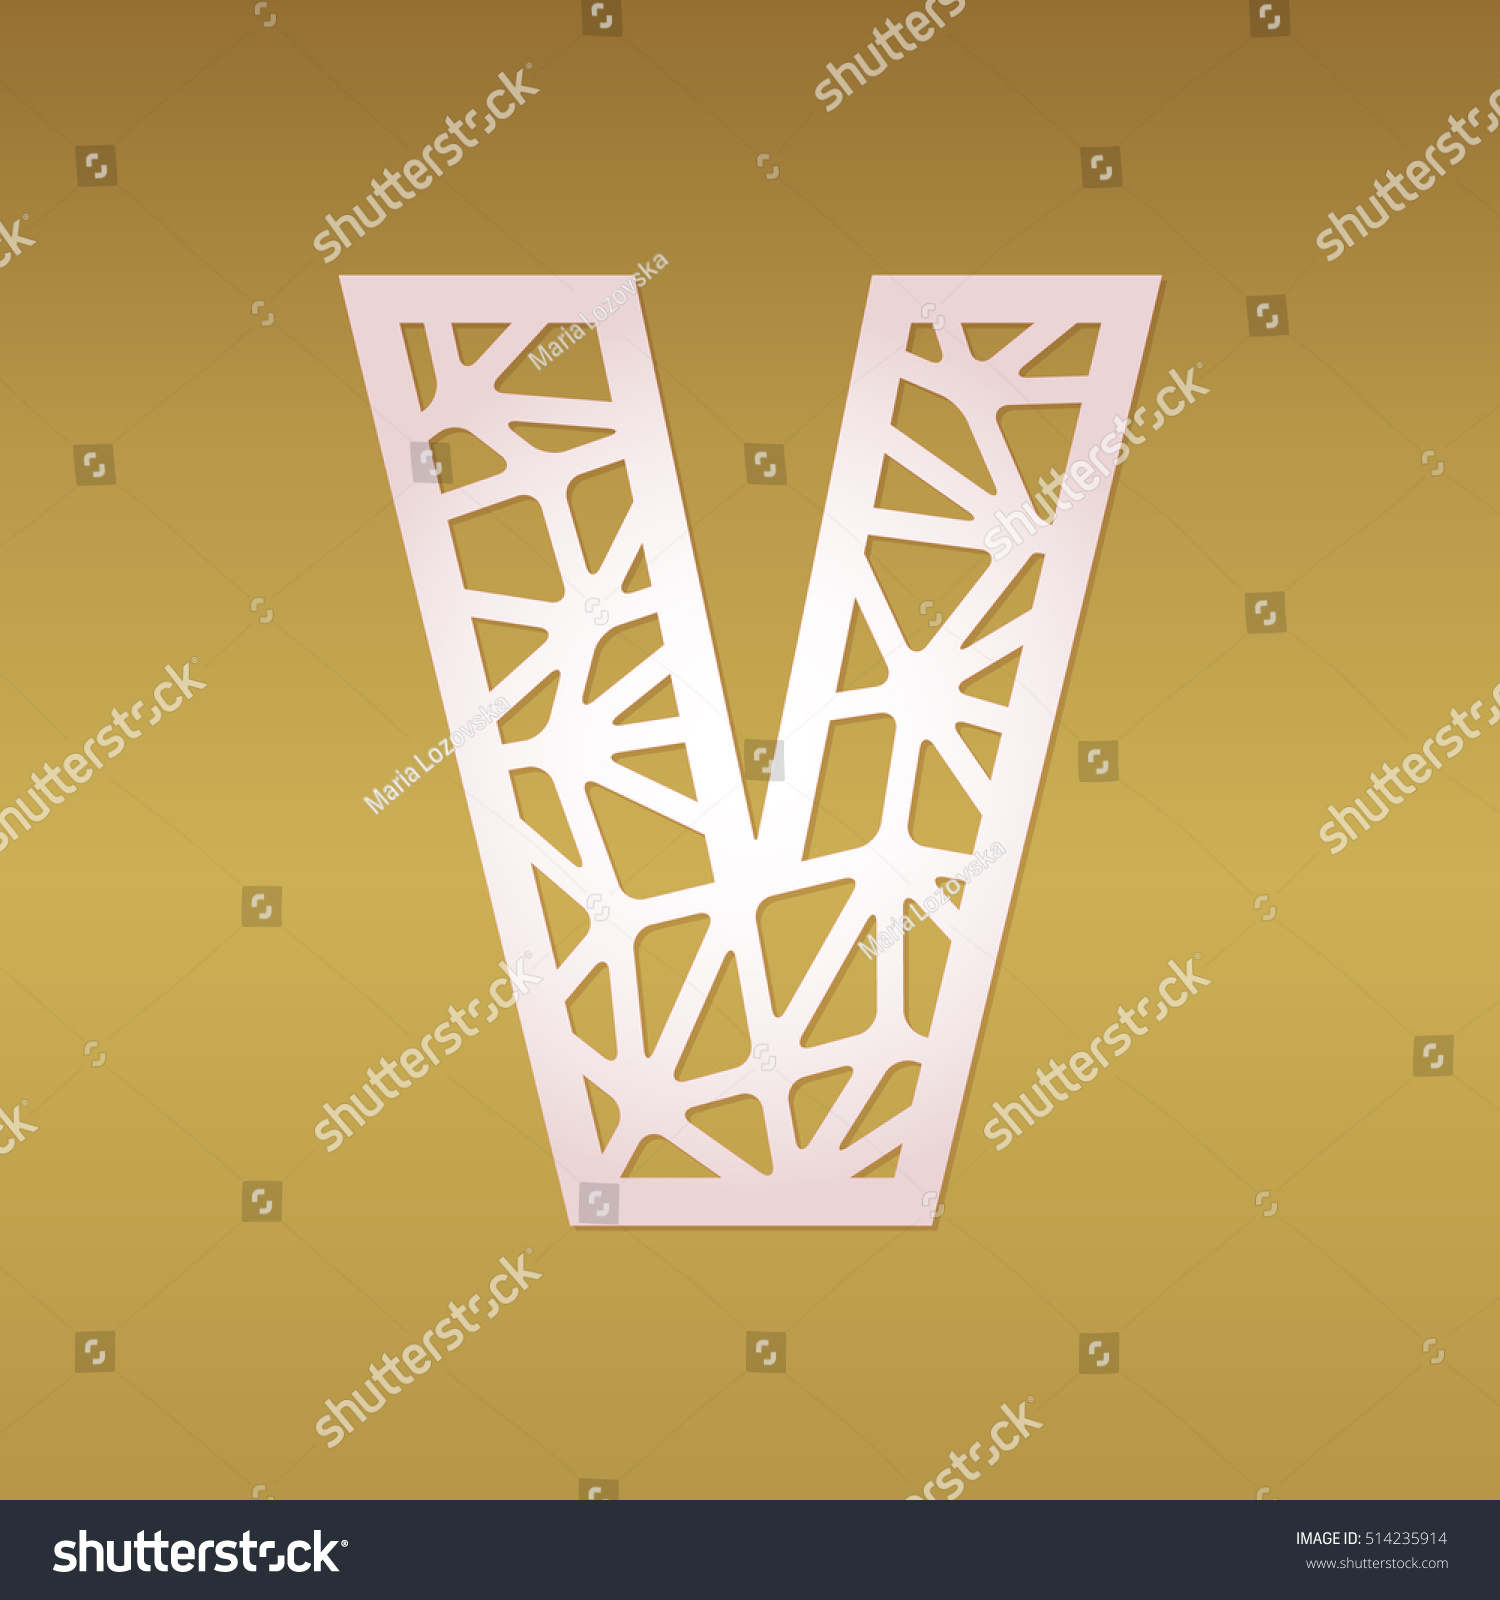 Mosaic Vector Capital Letter V Laser Stock Photo (Photo, Vector ...